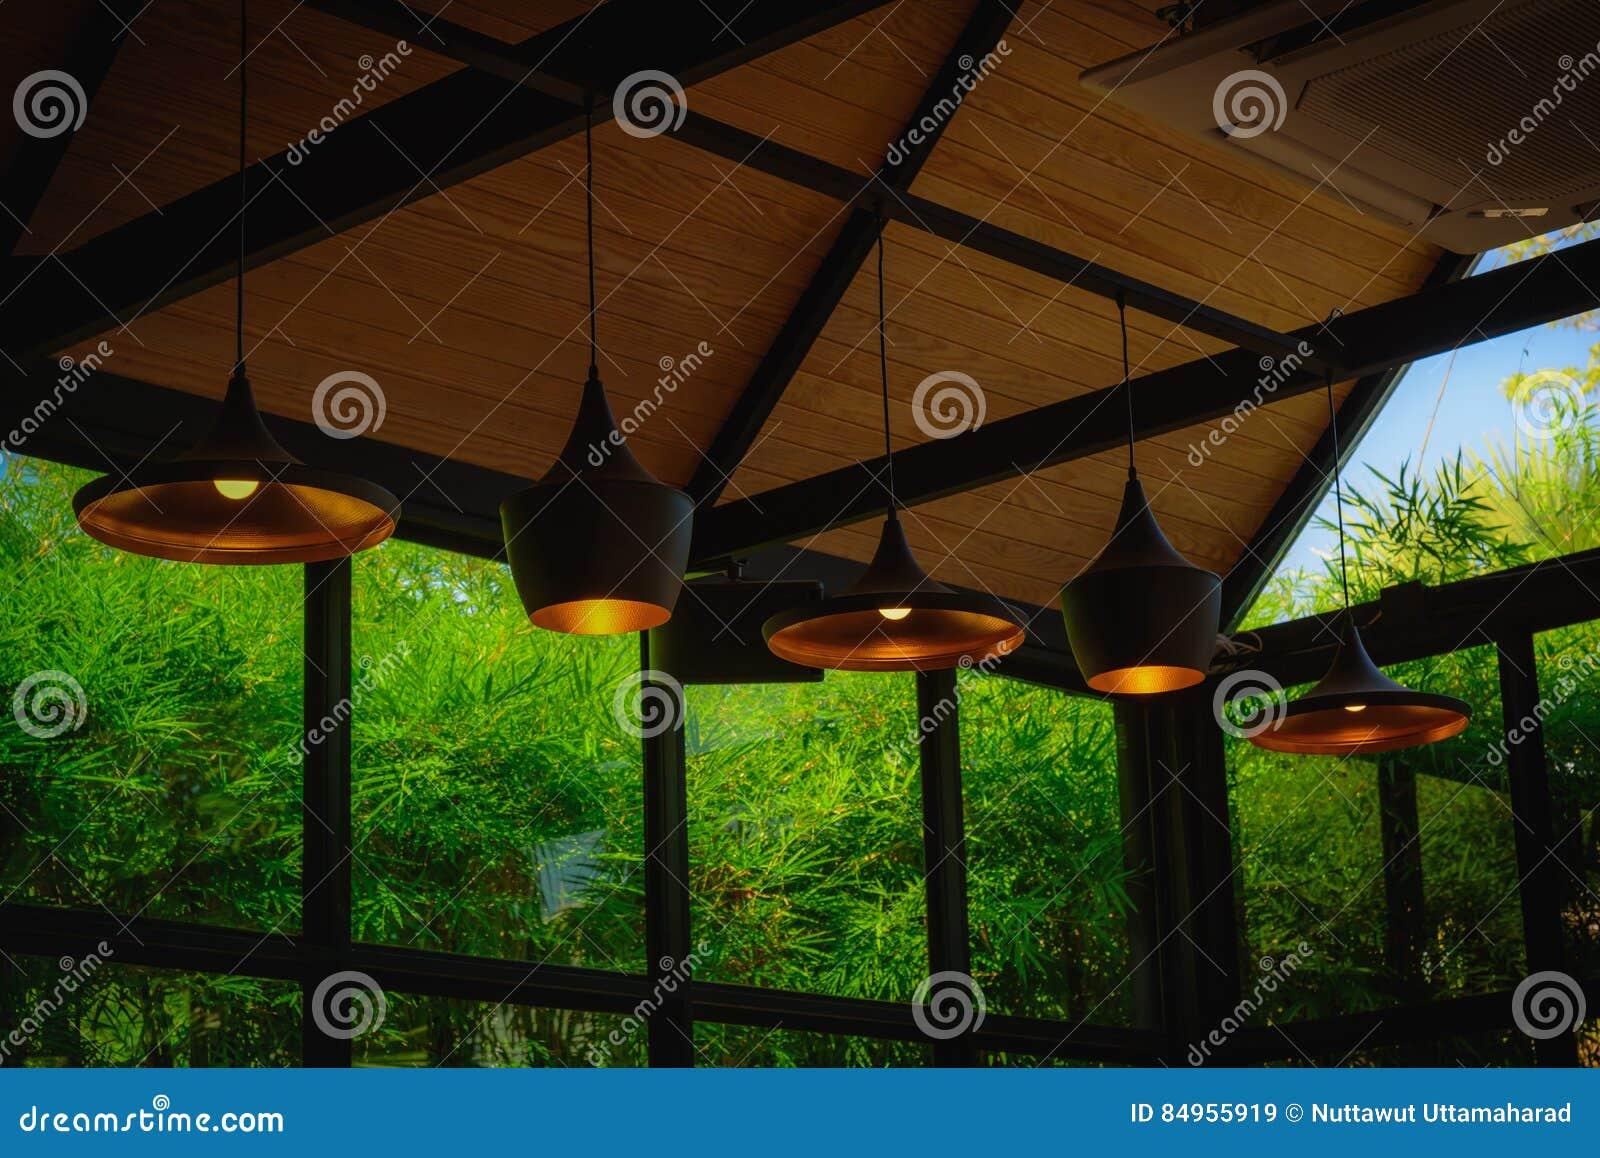 Interior Lighting Decor In Coffee Shop Stock Image Image Of